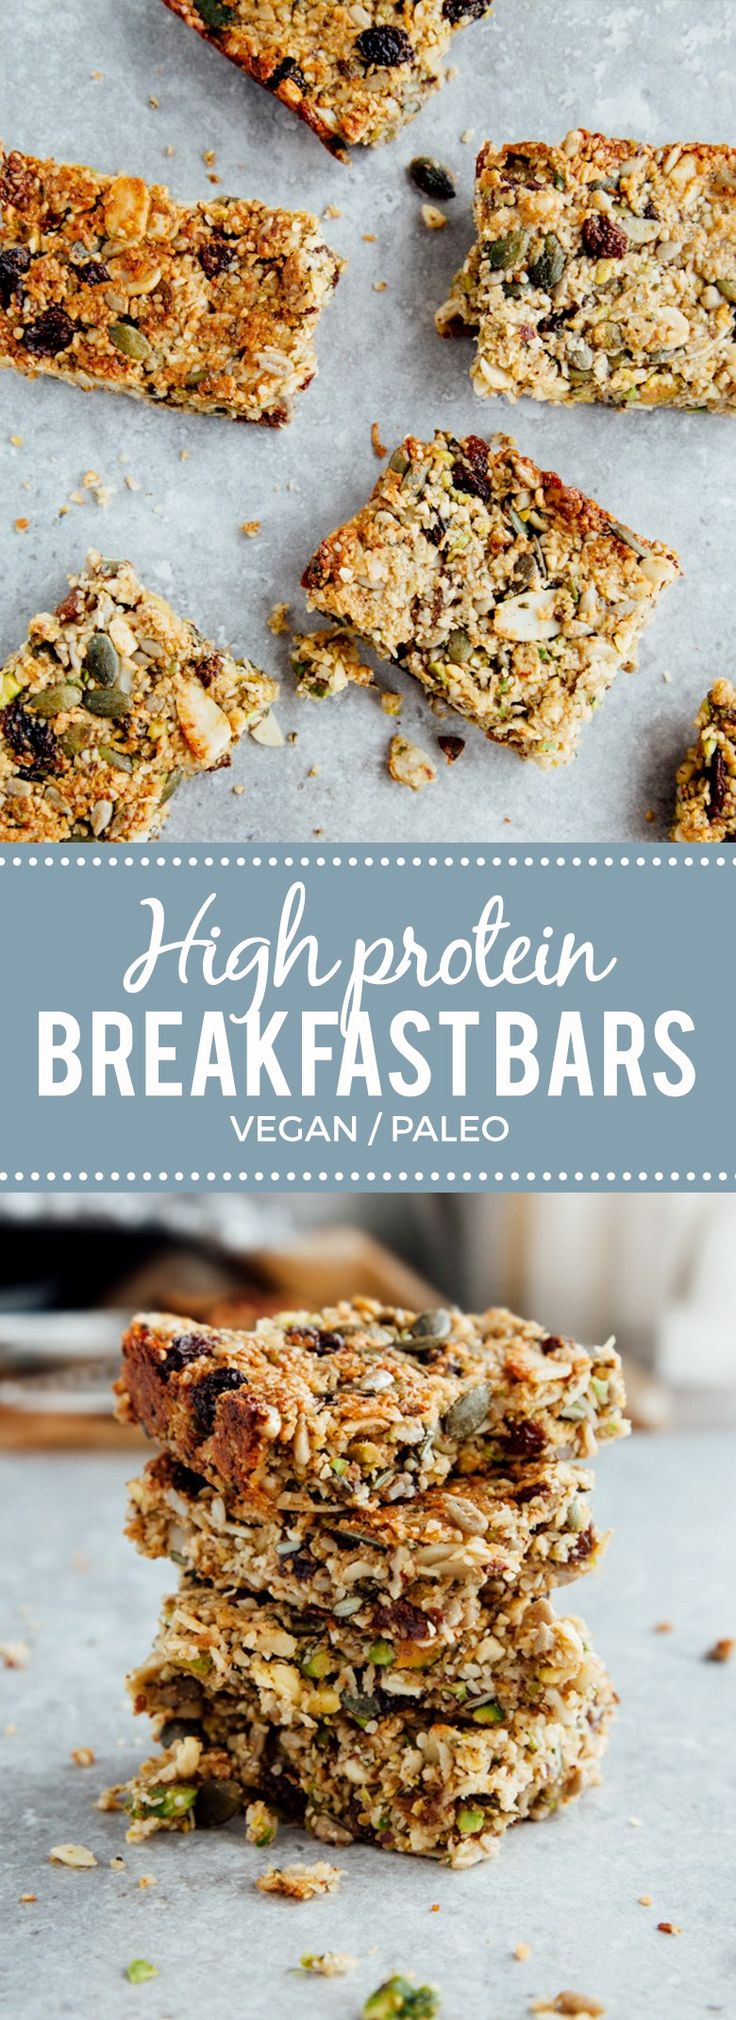 Buy it here! Protein Breakfast Bars (Vegan   Paleo)